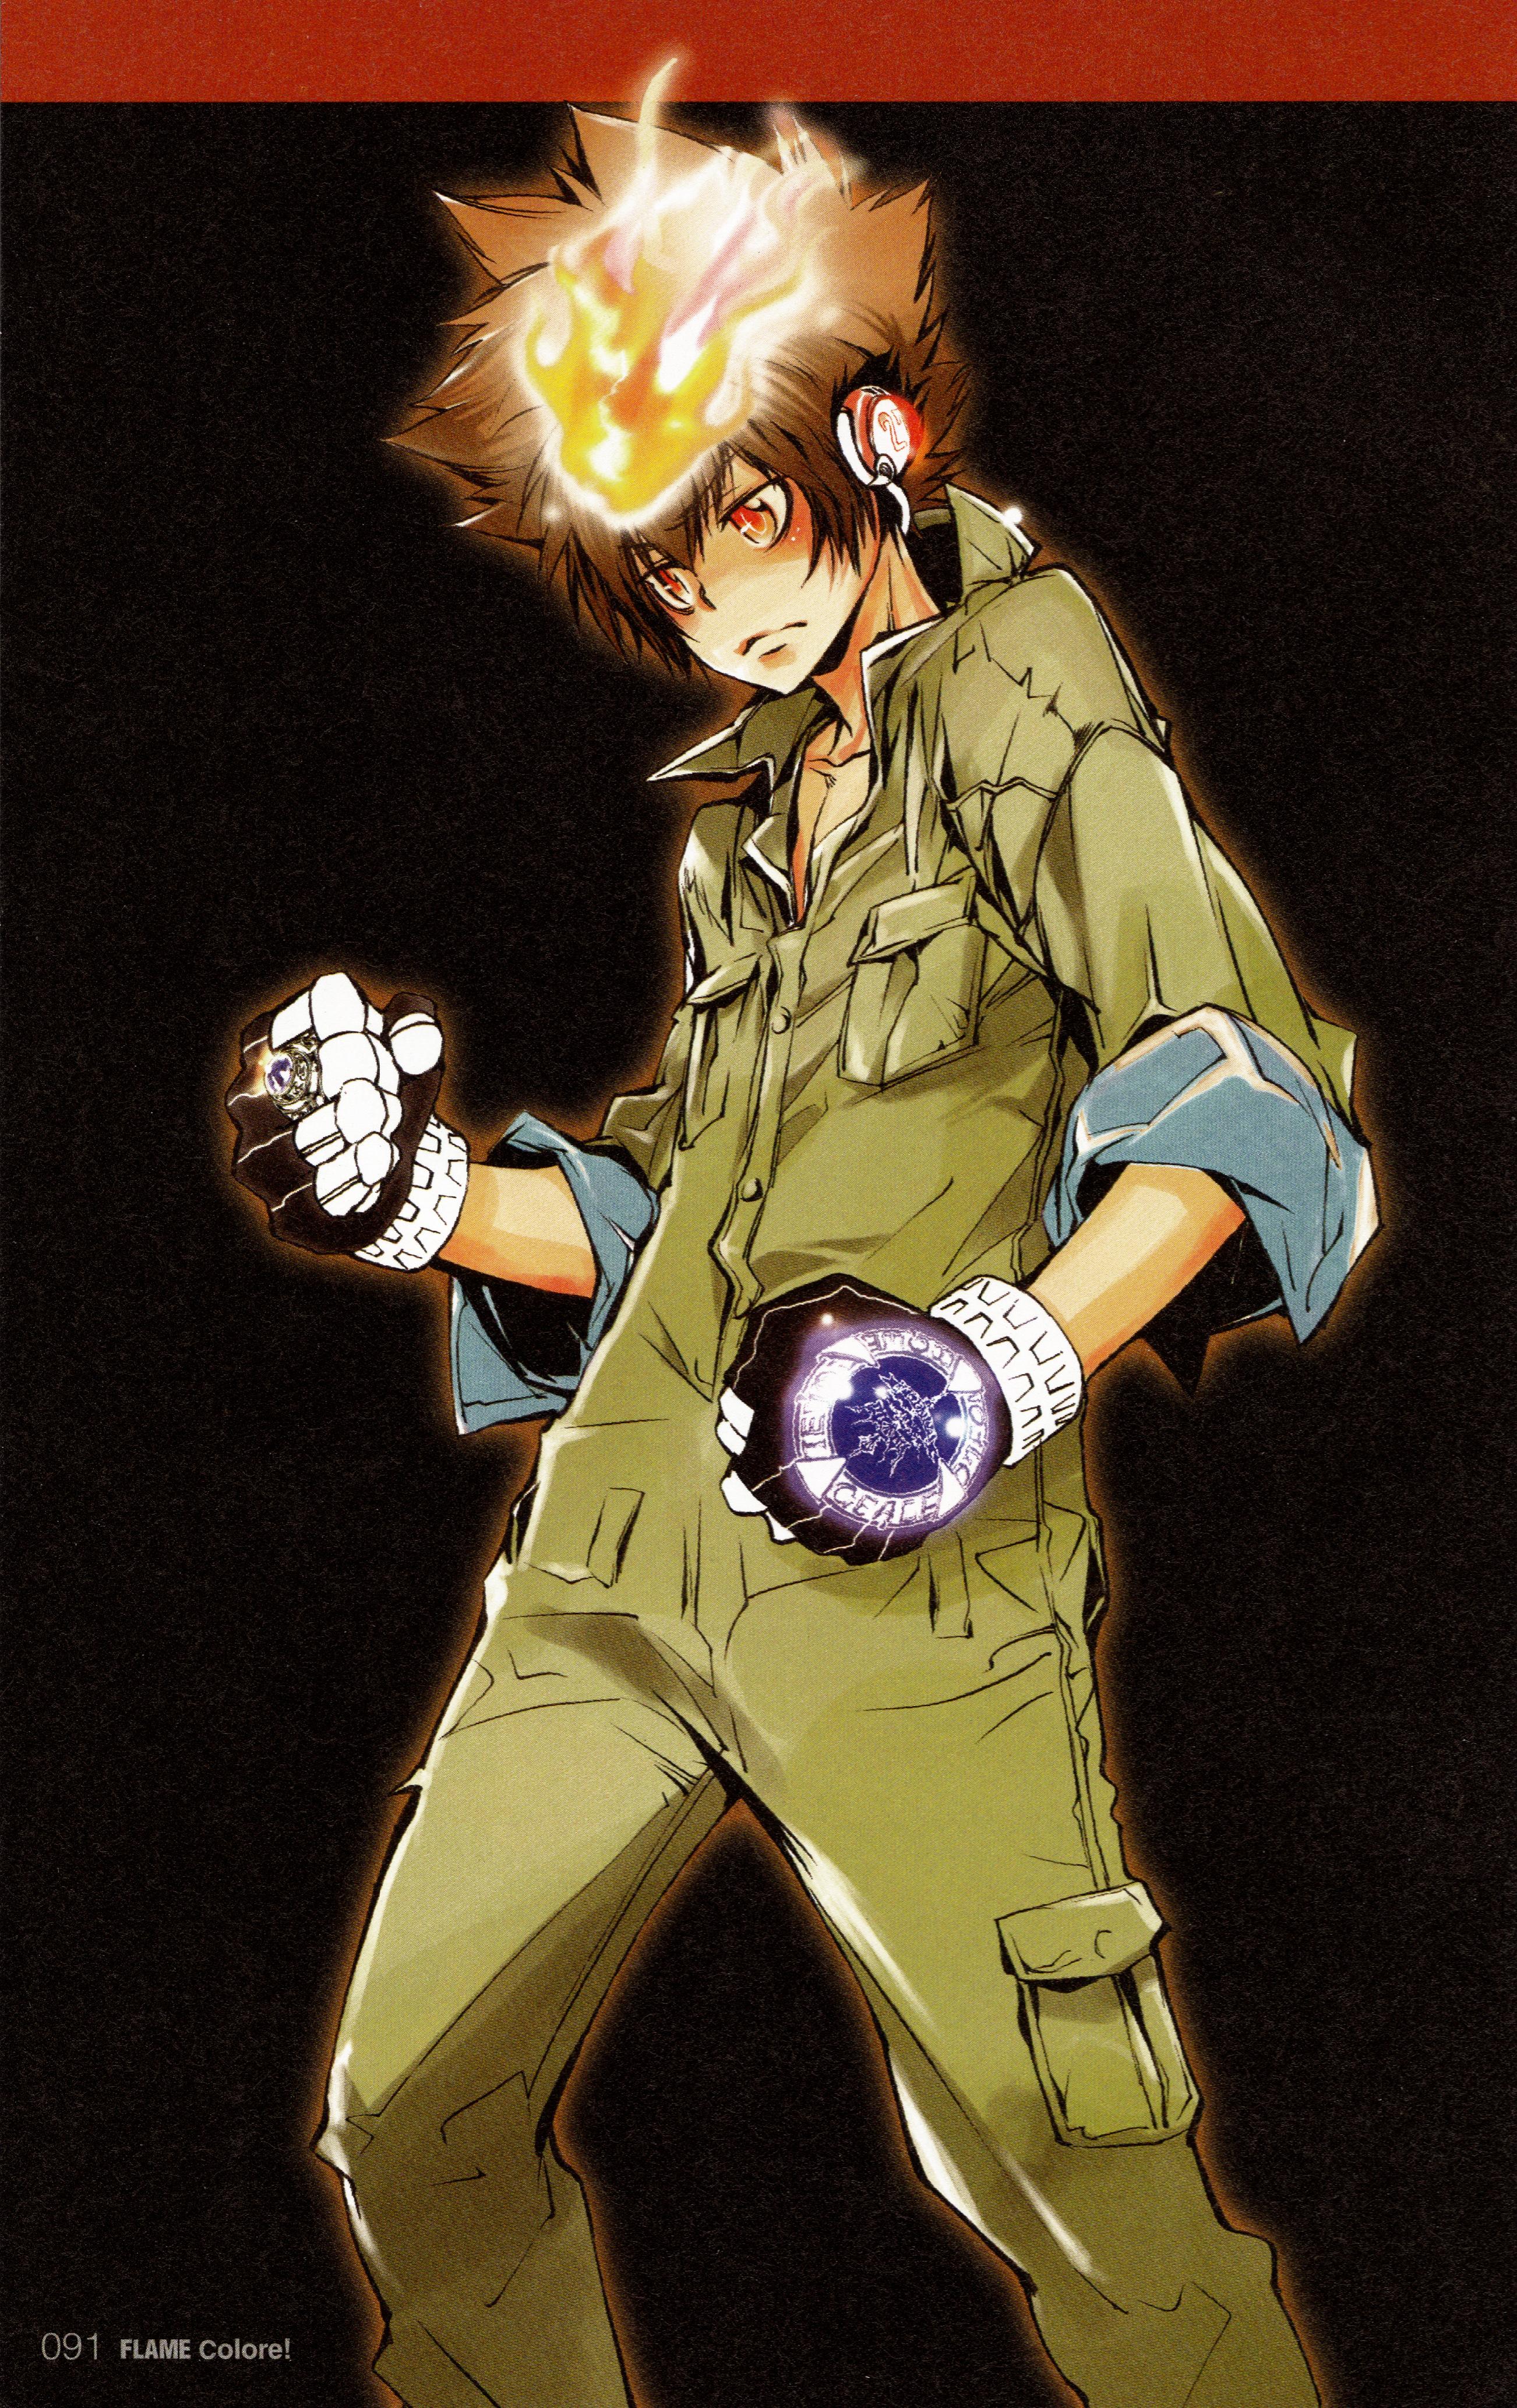 Anime Characters Jumpsuit : Sawada tsunayoshi katekyo hitman reborn mobile